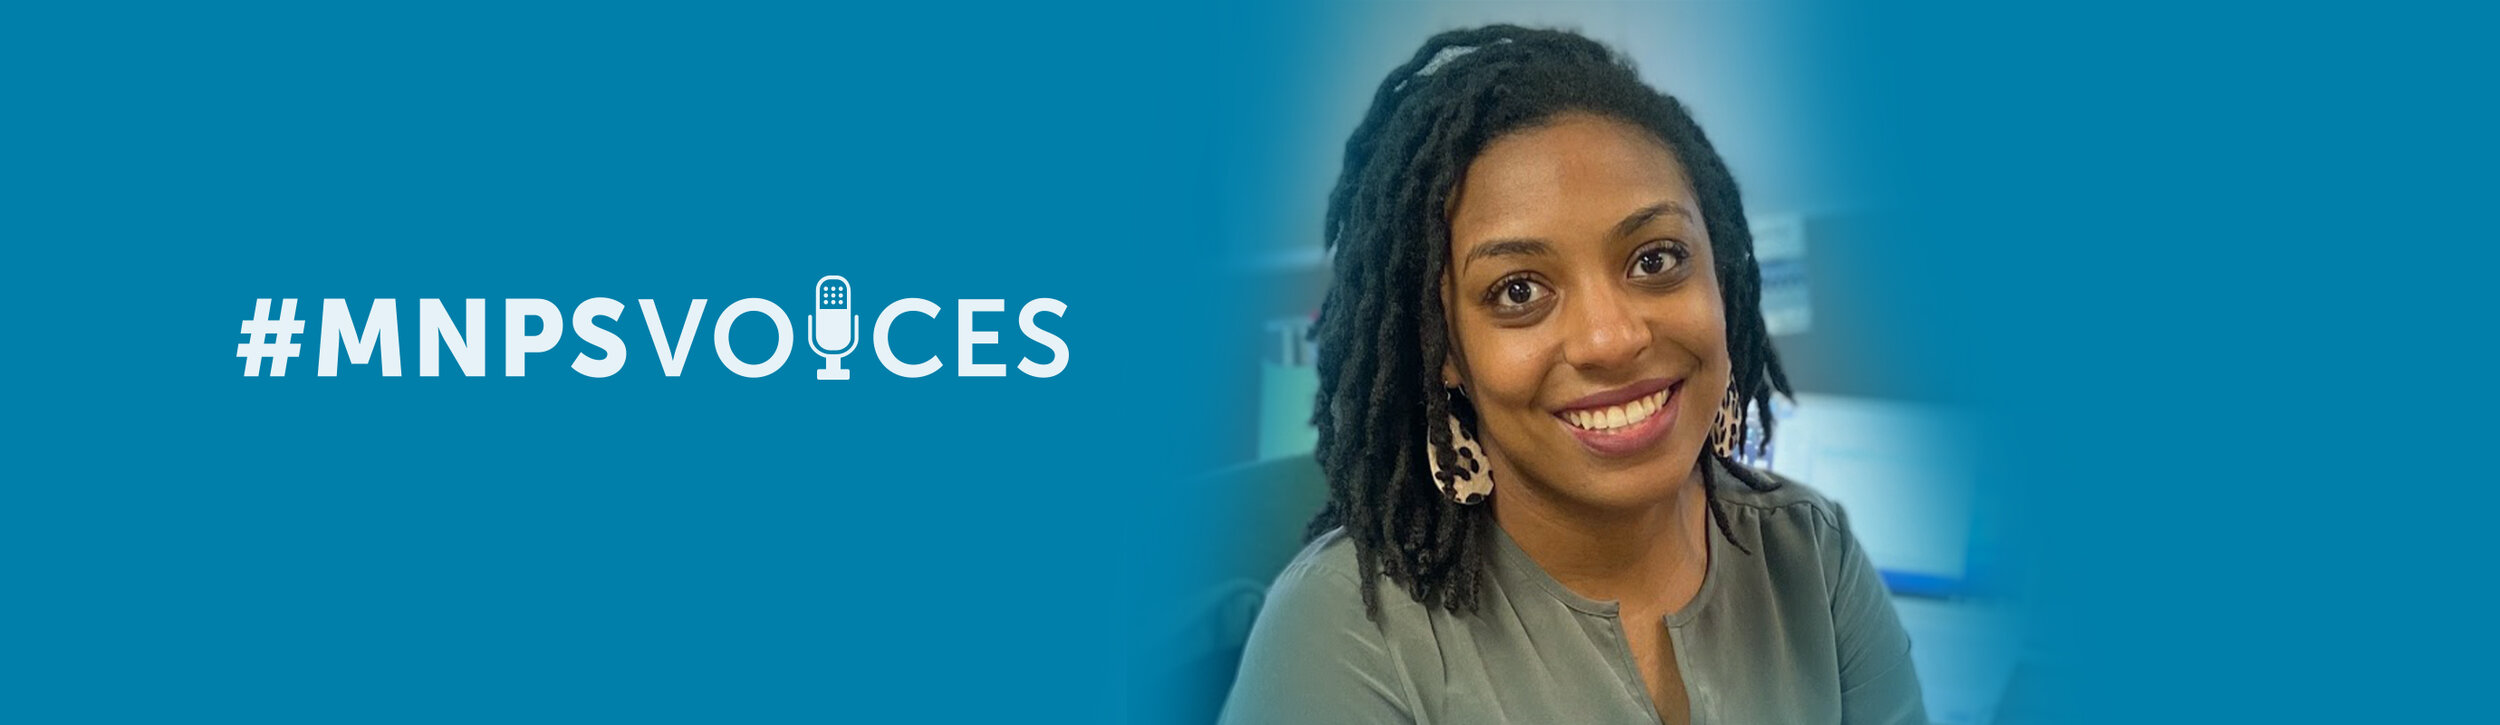 #MNPSVoices – Martina Johnson, Special Populations Coordinator